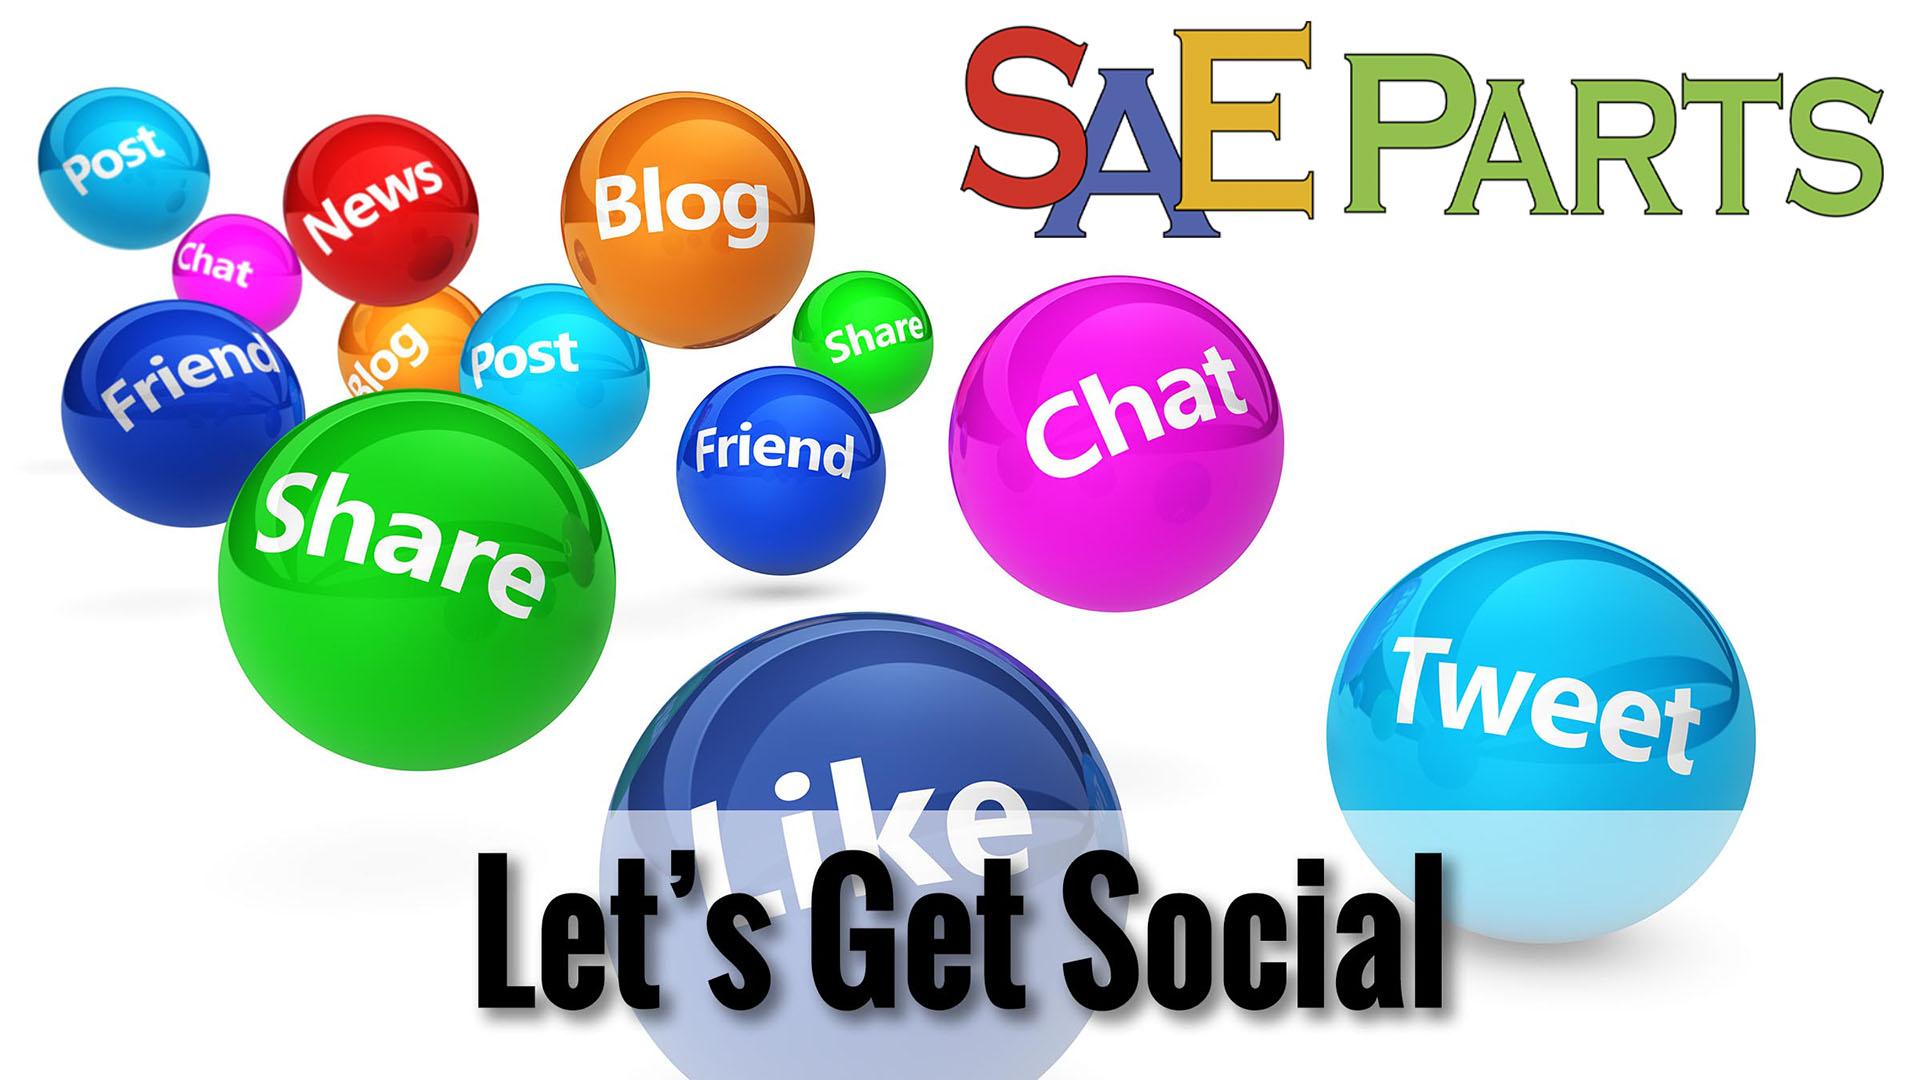 Lets get social - SAE Parts